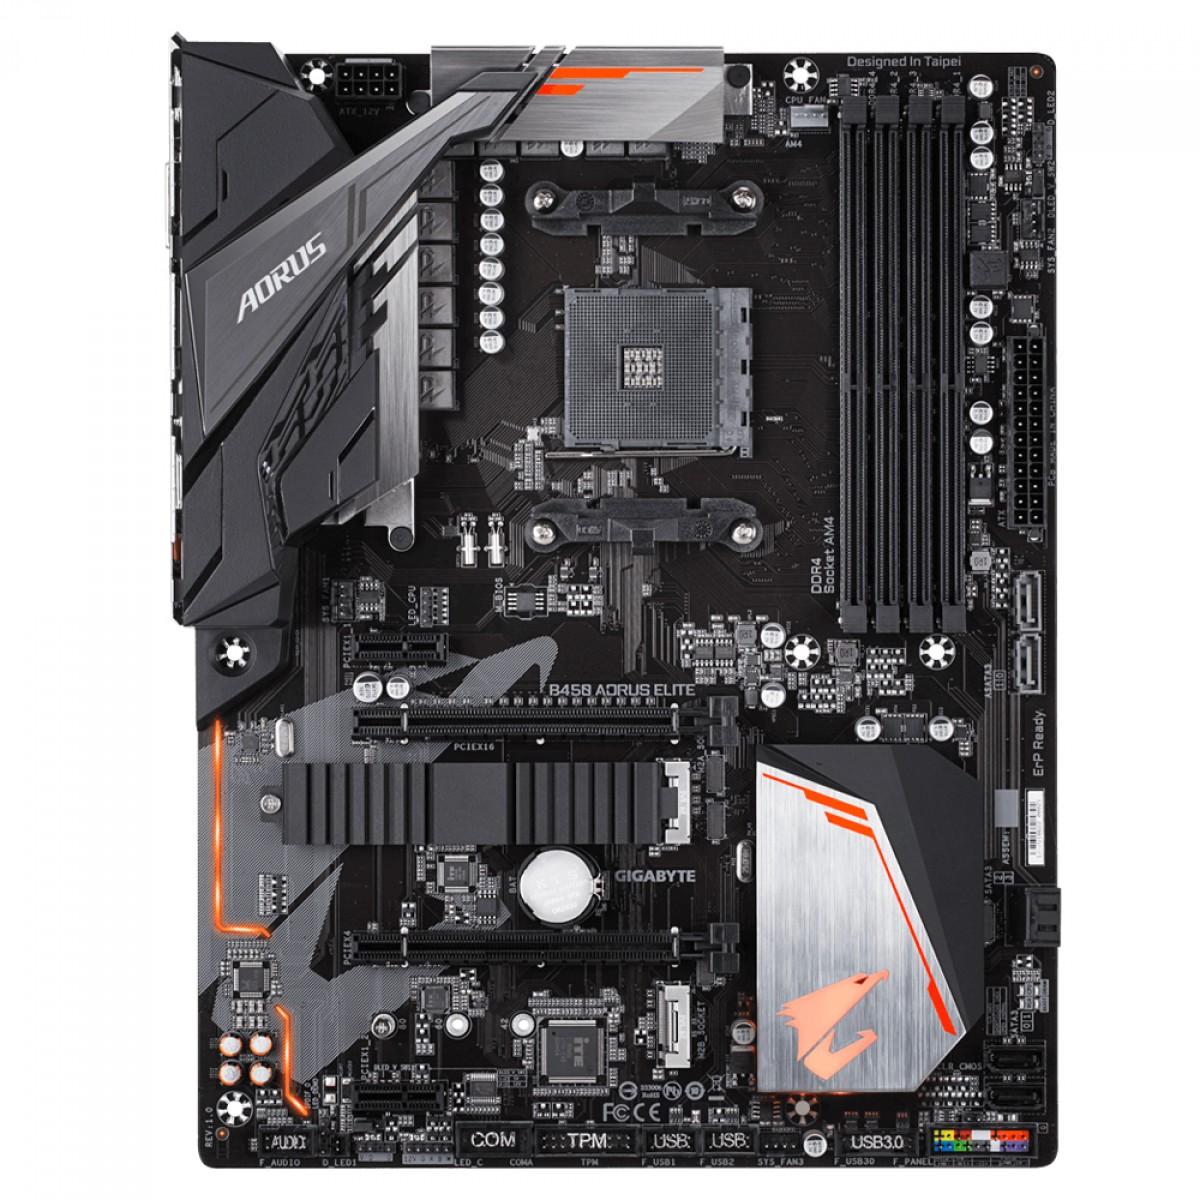 Kit Upgrade AMD Ryzen 5 PRO 4650G + Gigabyte B450 Aorus Elite